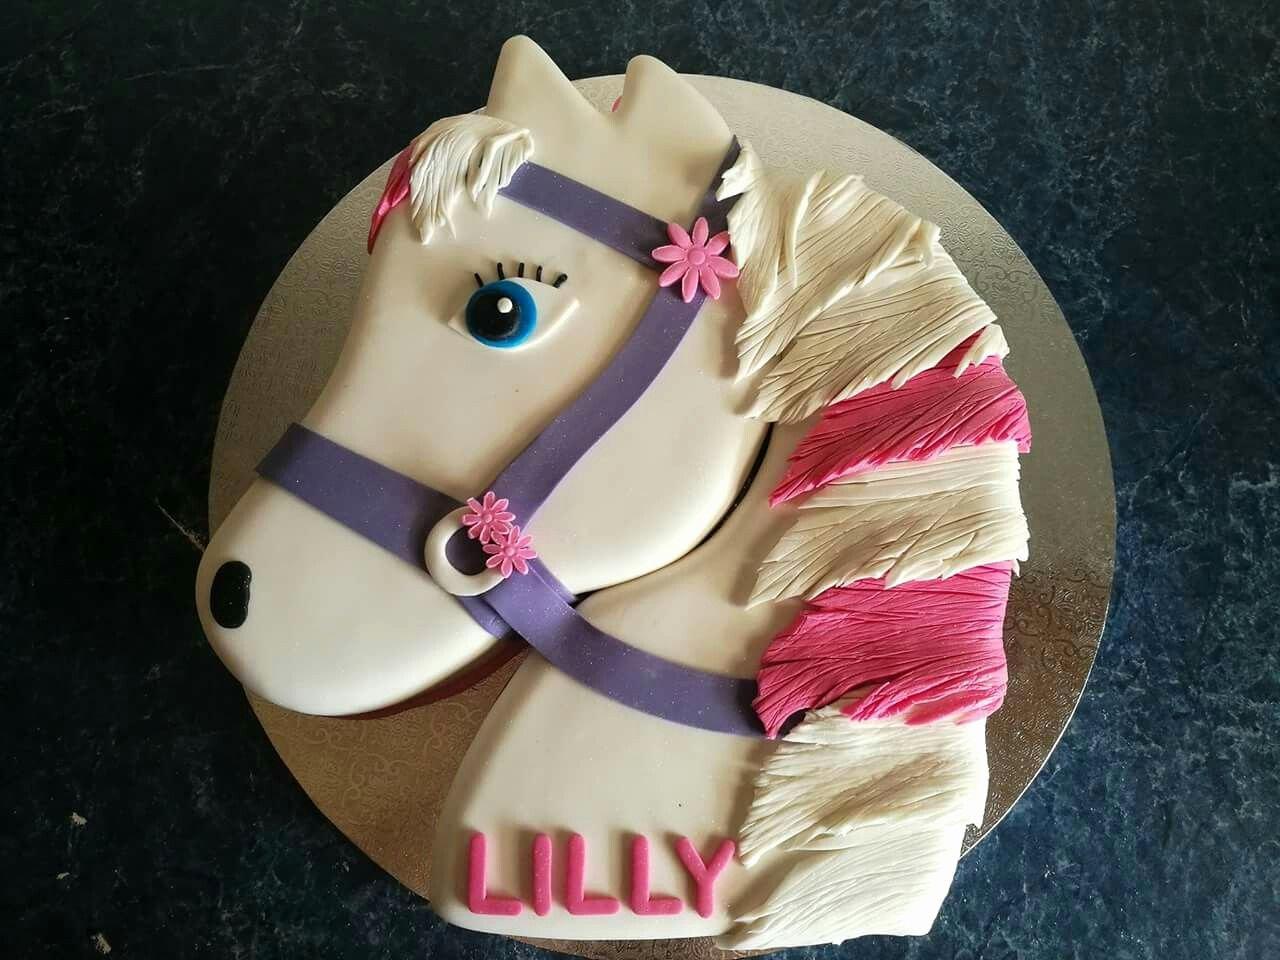 Horse Cake Template Lovely Majestic Horse Head Birthday Cake